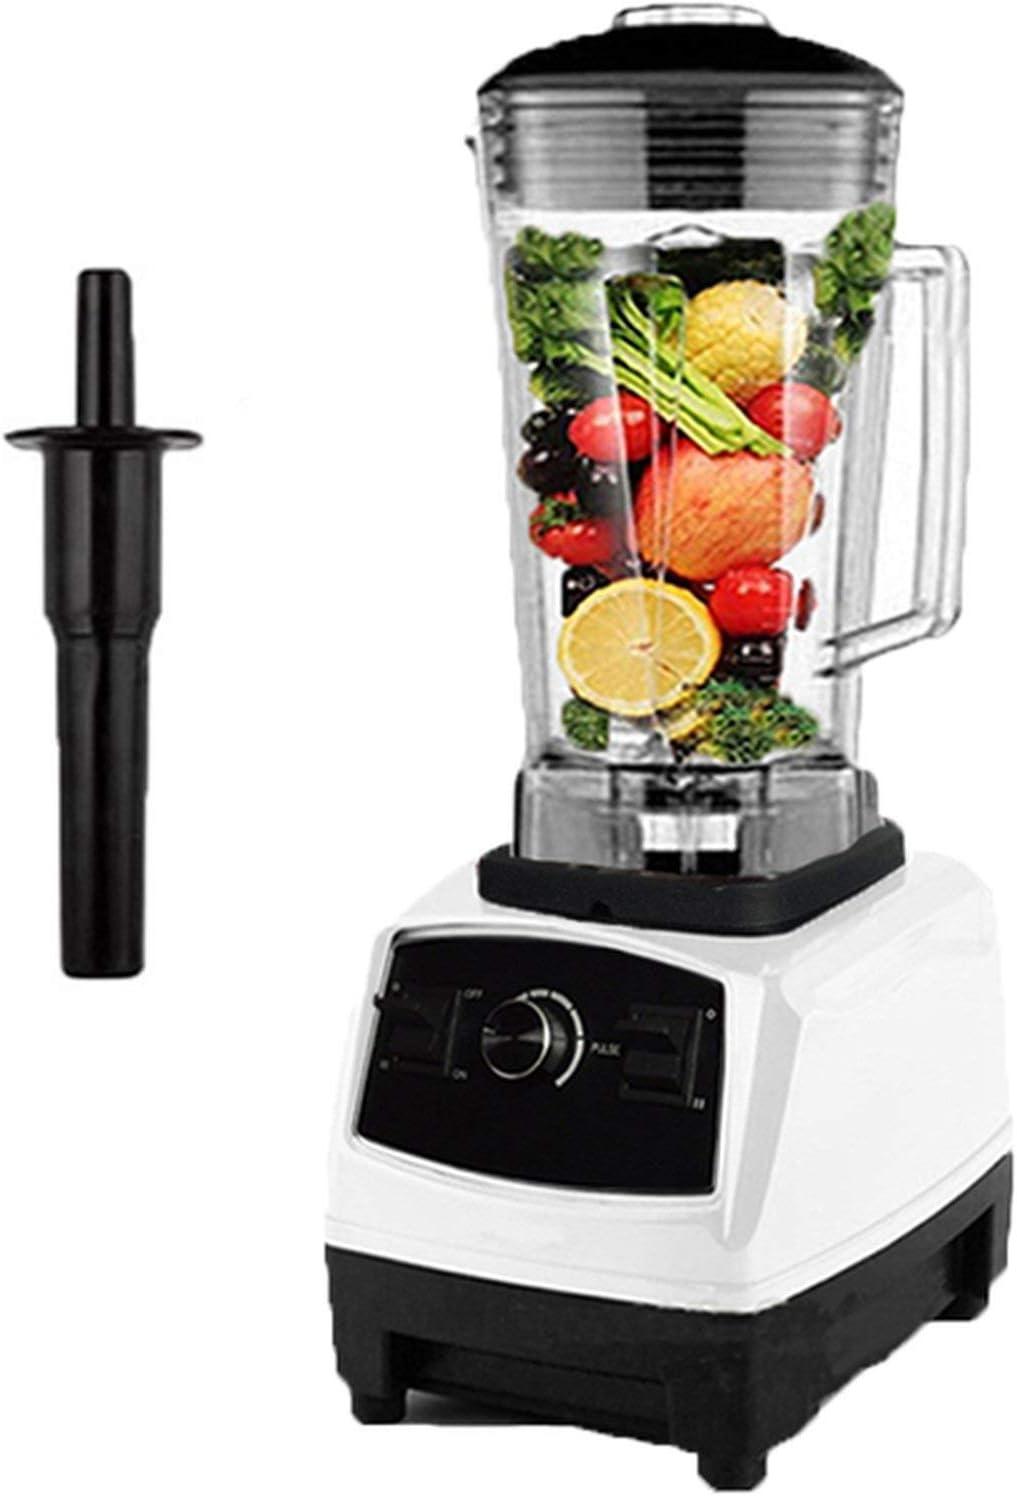 BPA free 2200W Heavy Duty Commercial Professional Mixer Food Processor Japan Blade Juicer Ice Smoothie Machine,White,EU Plug